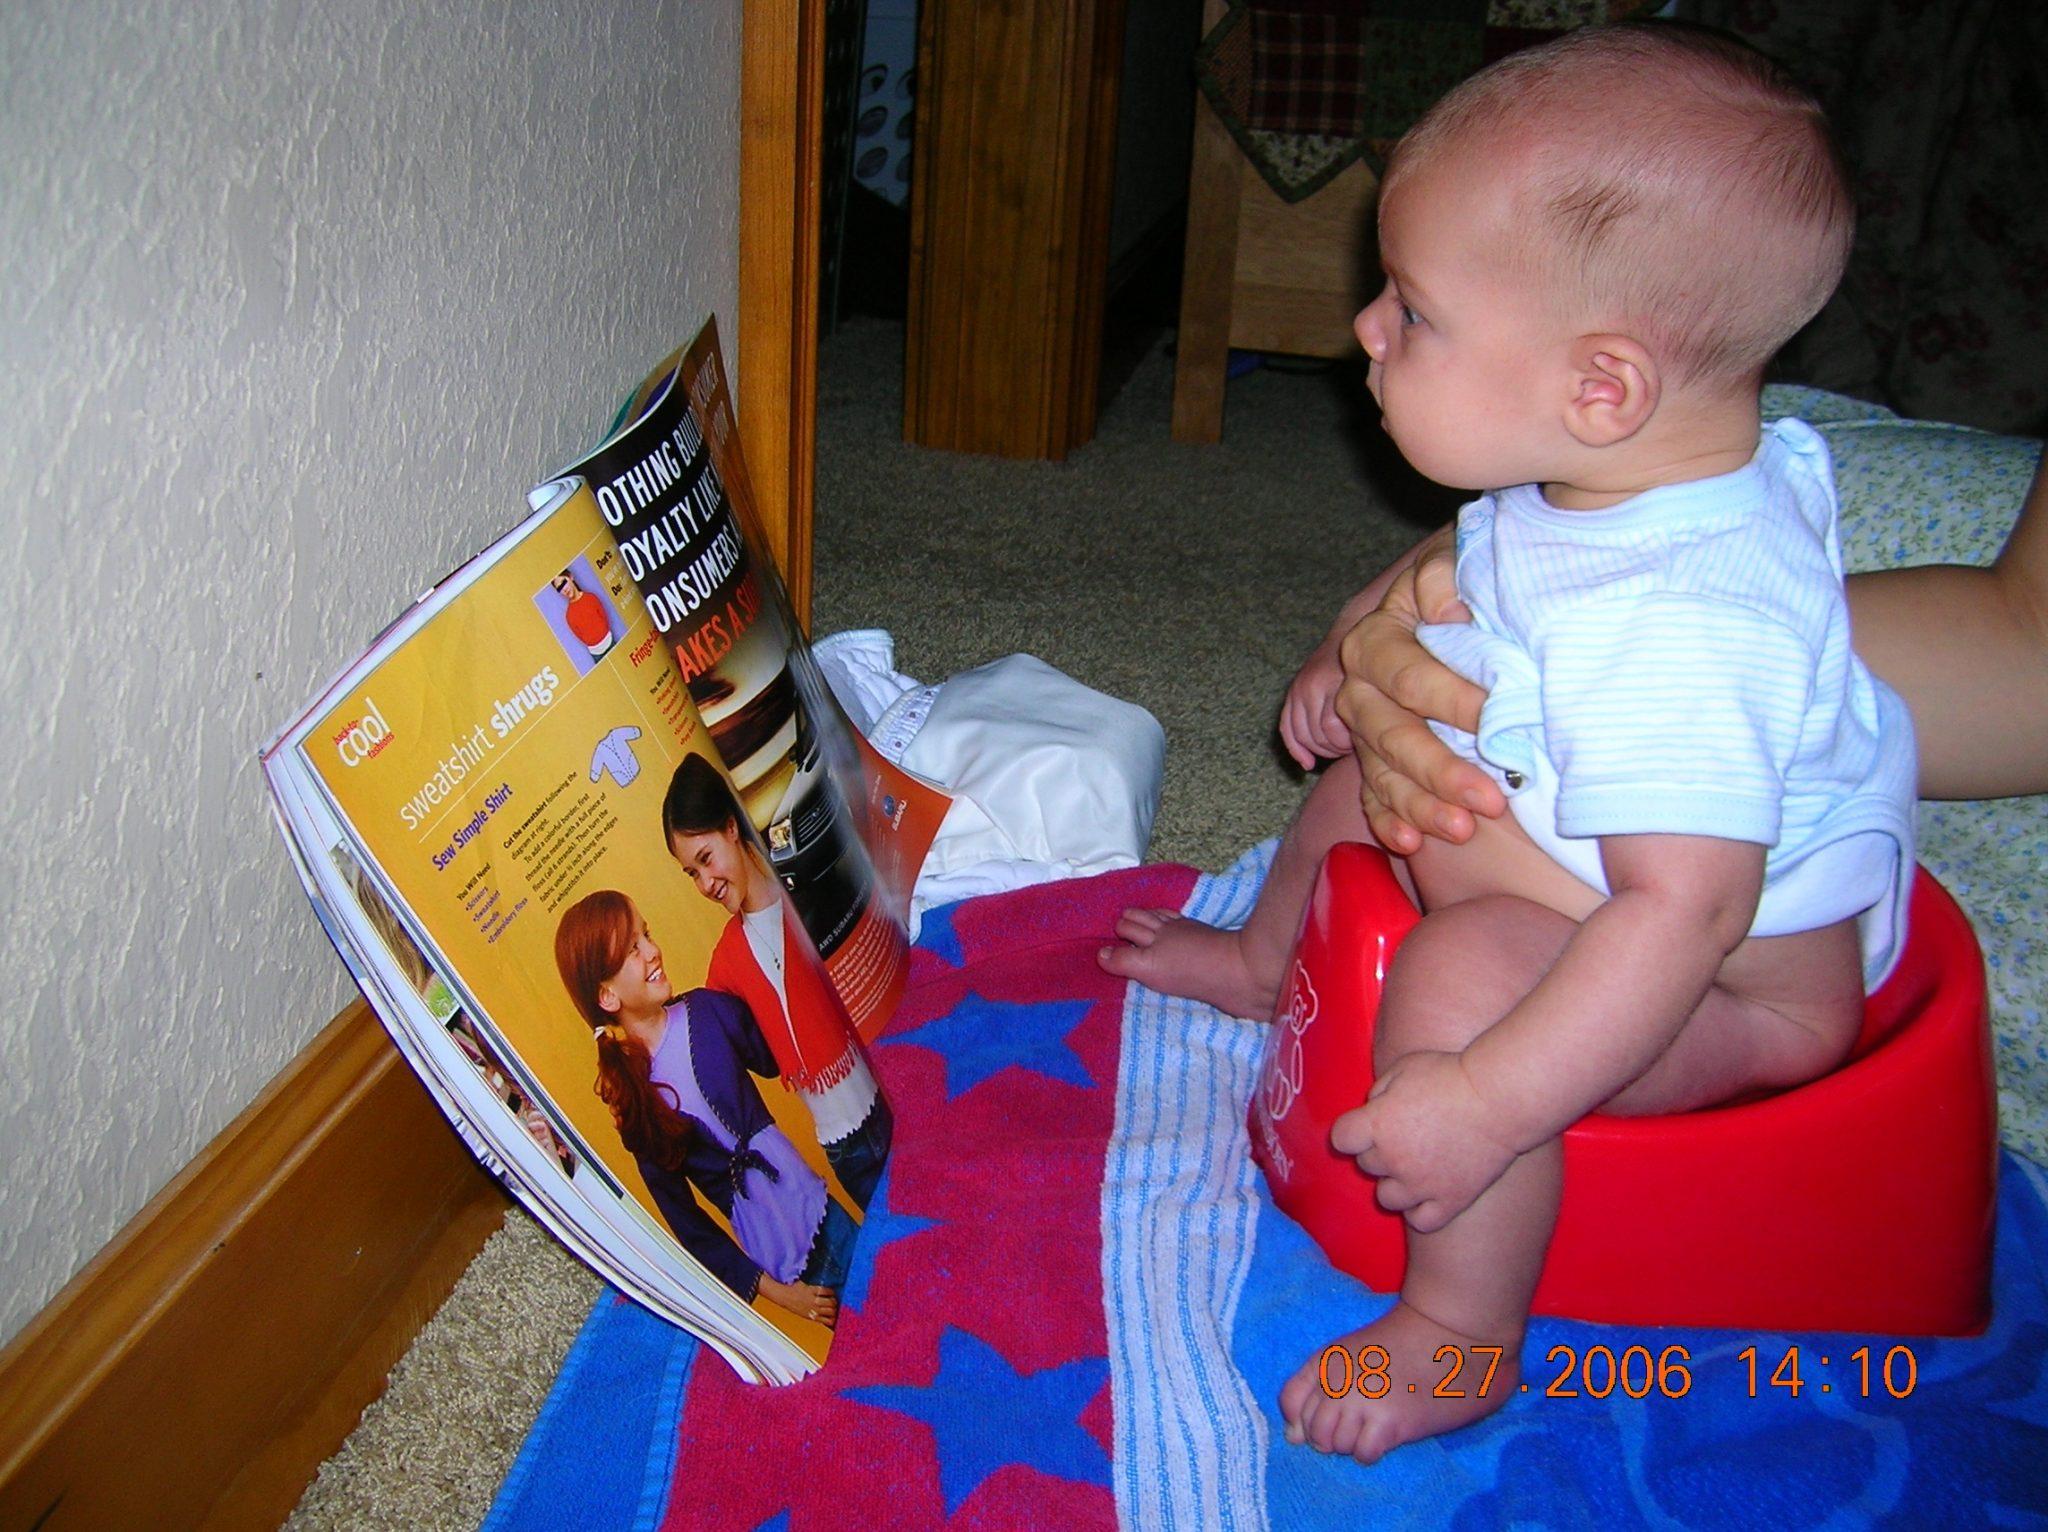 early potty training methods